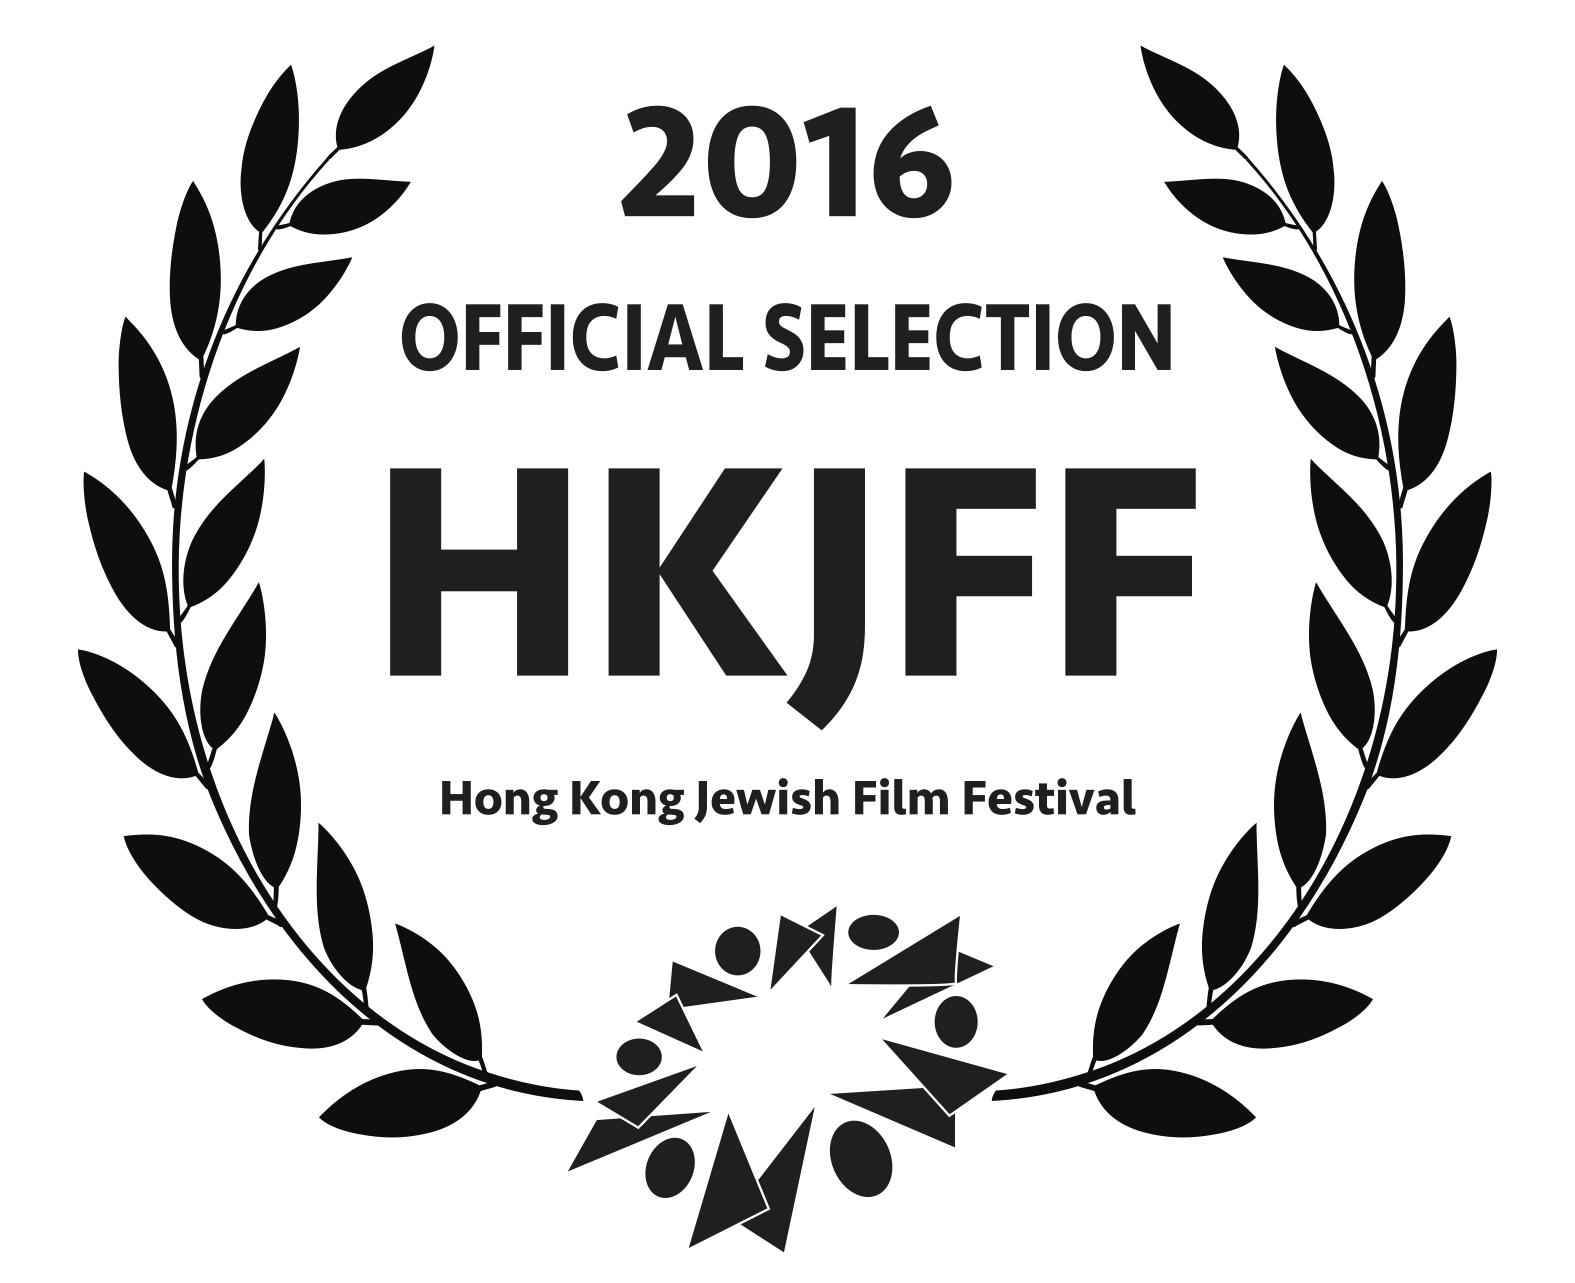 hkjff2016_officialselection_laurel